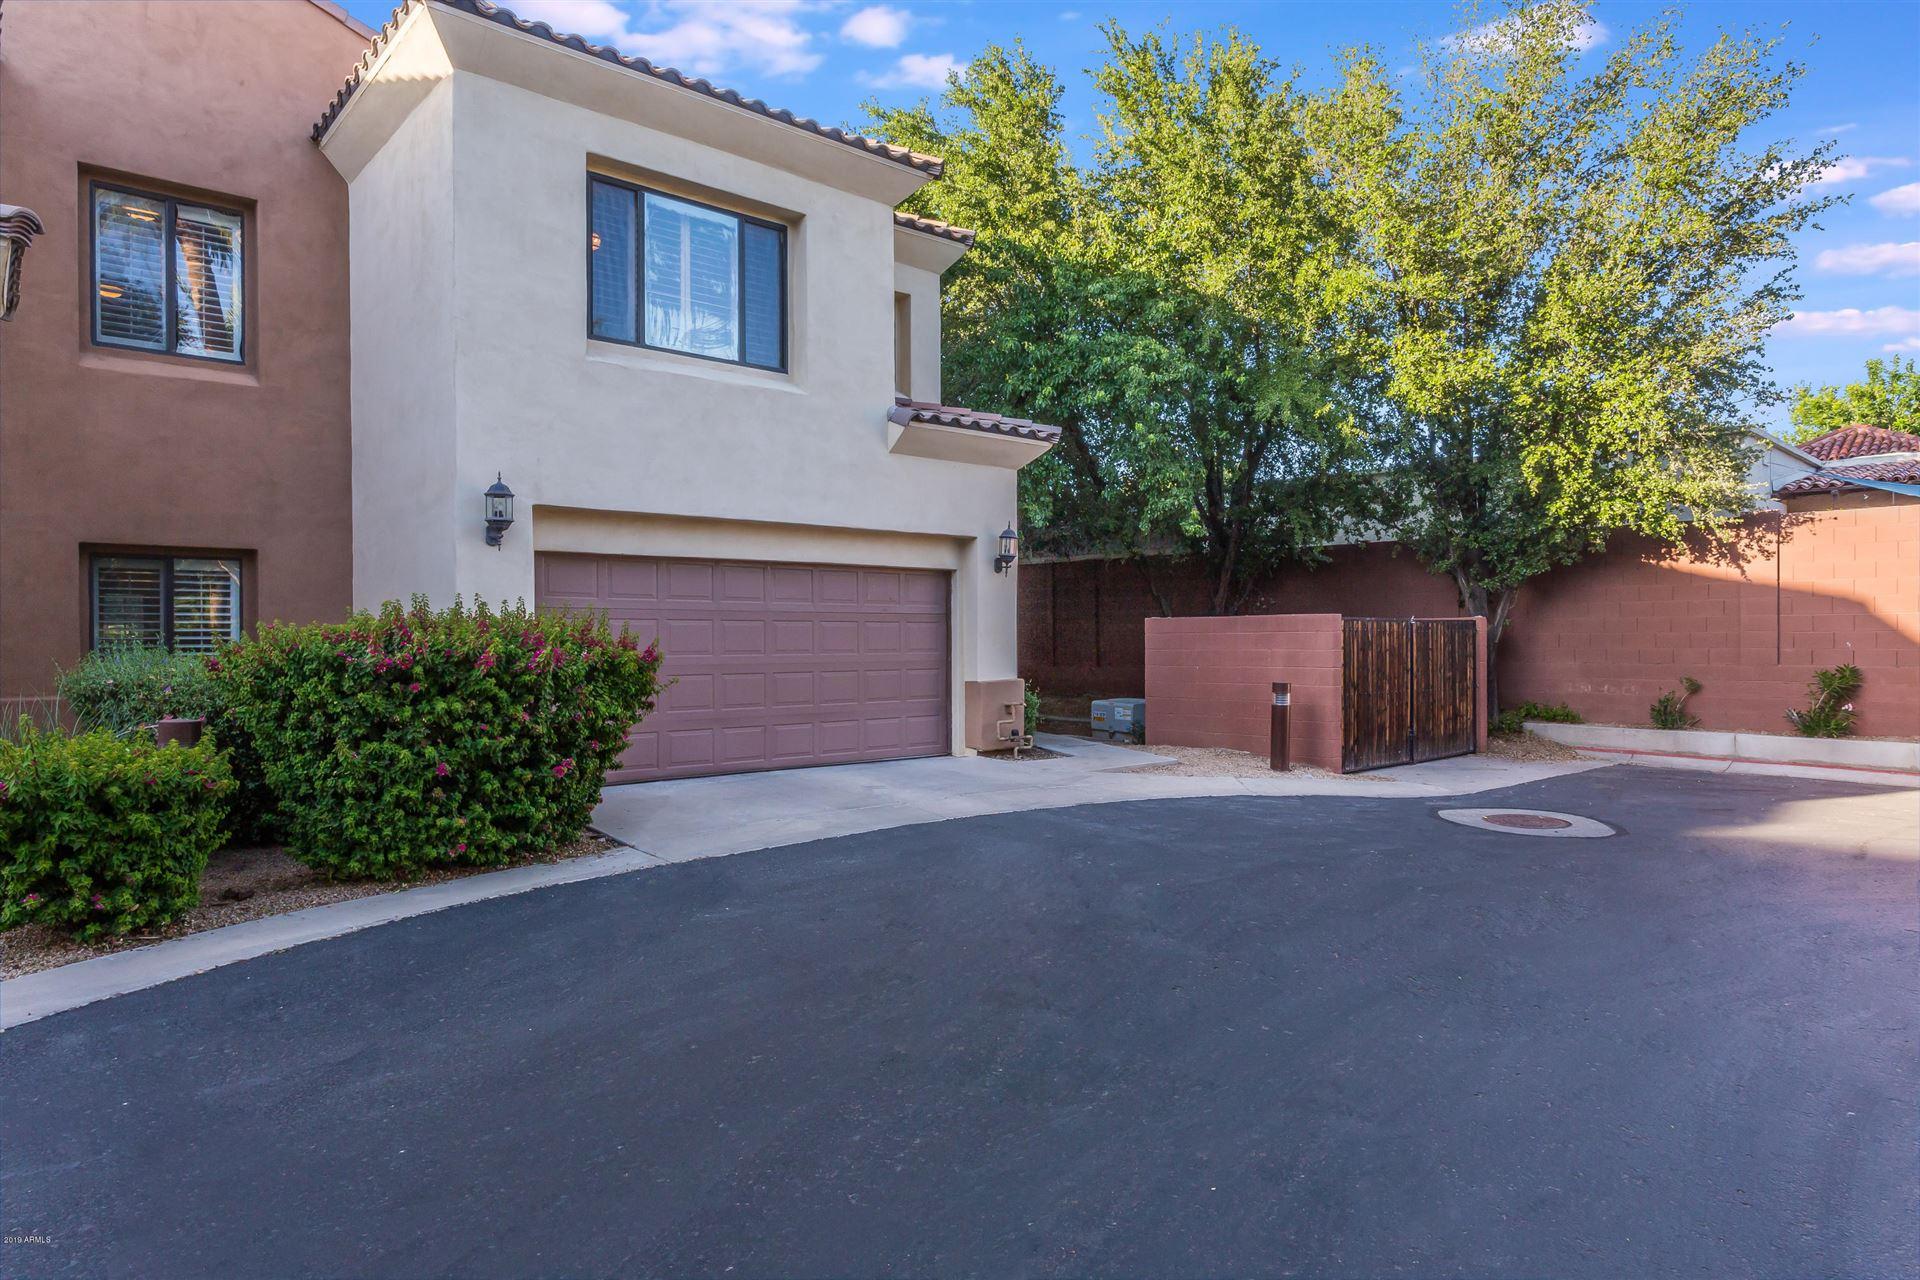 1102 W GLENDALE Avenue #125, Phoenix, AZ 85021 - MLS#: 6077514